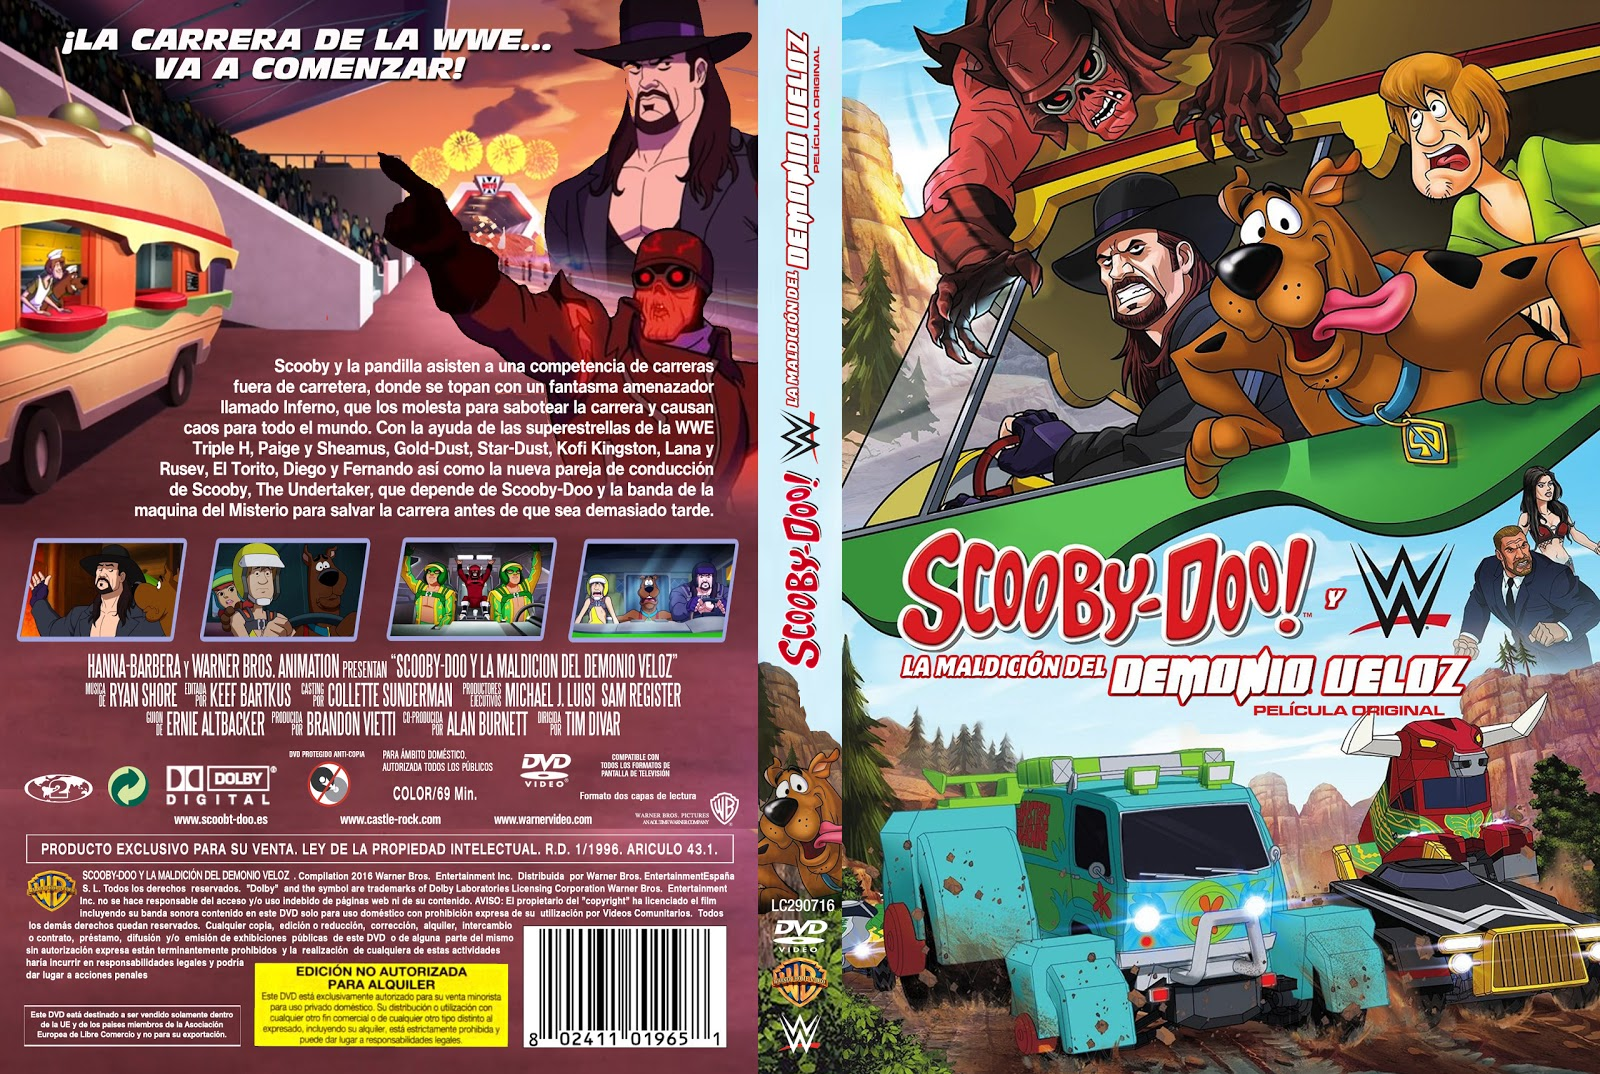 Scooby-Doo e WWE Maldição do Demônio Veloz DVD-R SCOOBY